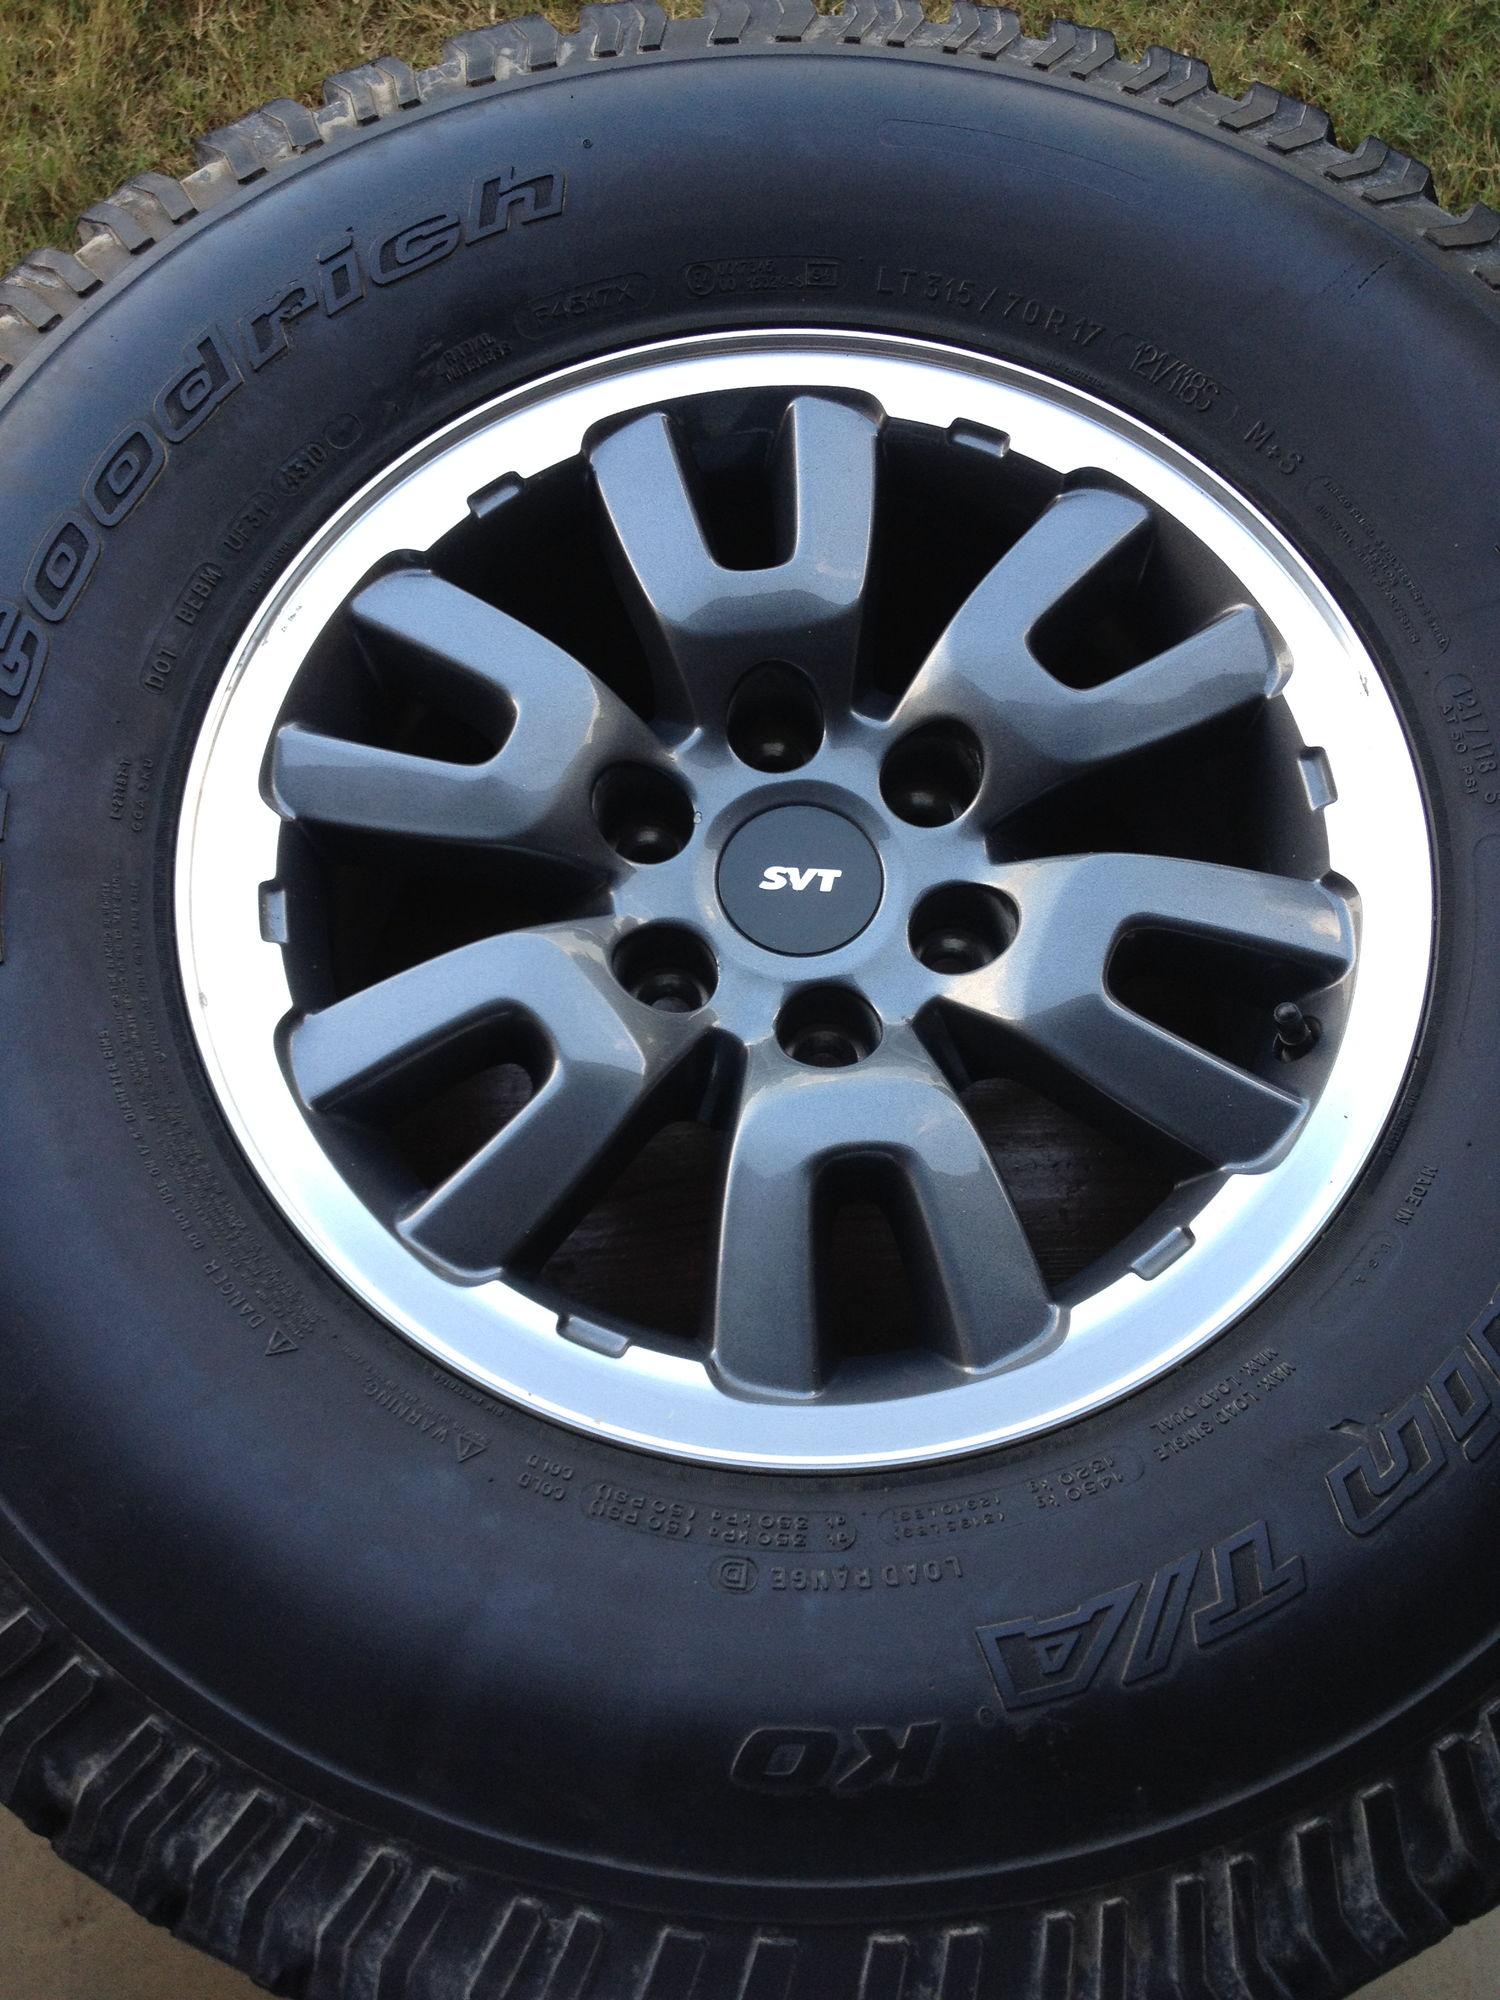 2014 Ford F 150 Svt Raptor >> Southeast RAPTOR SVT WHEELS 1st GEN - Ford F150 Forum - Community of Ford Truck Fans